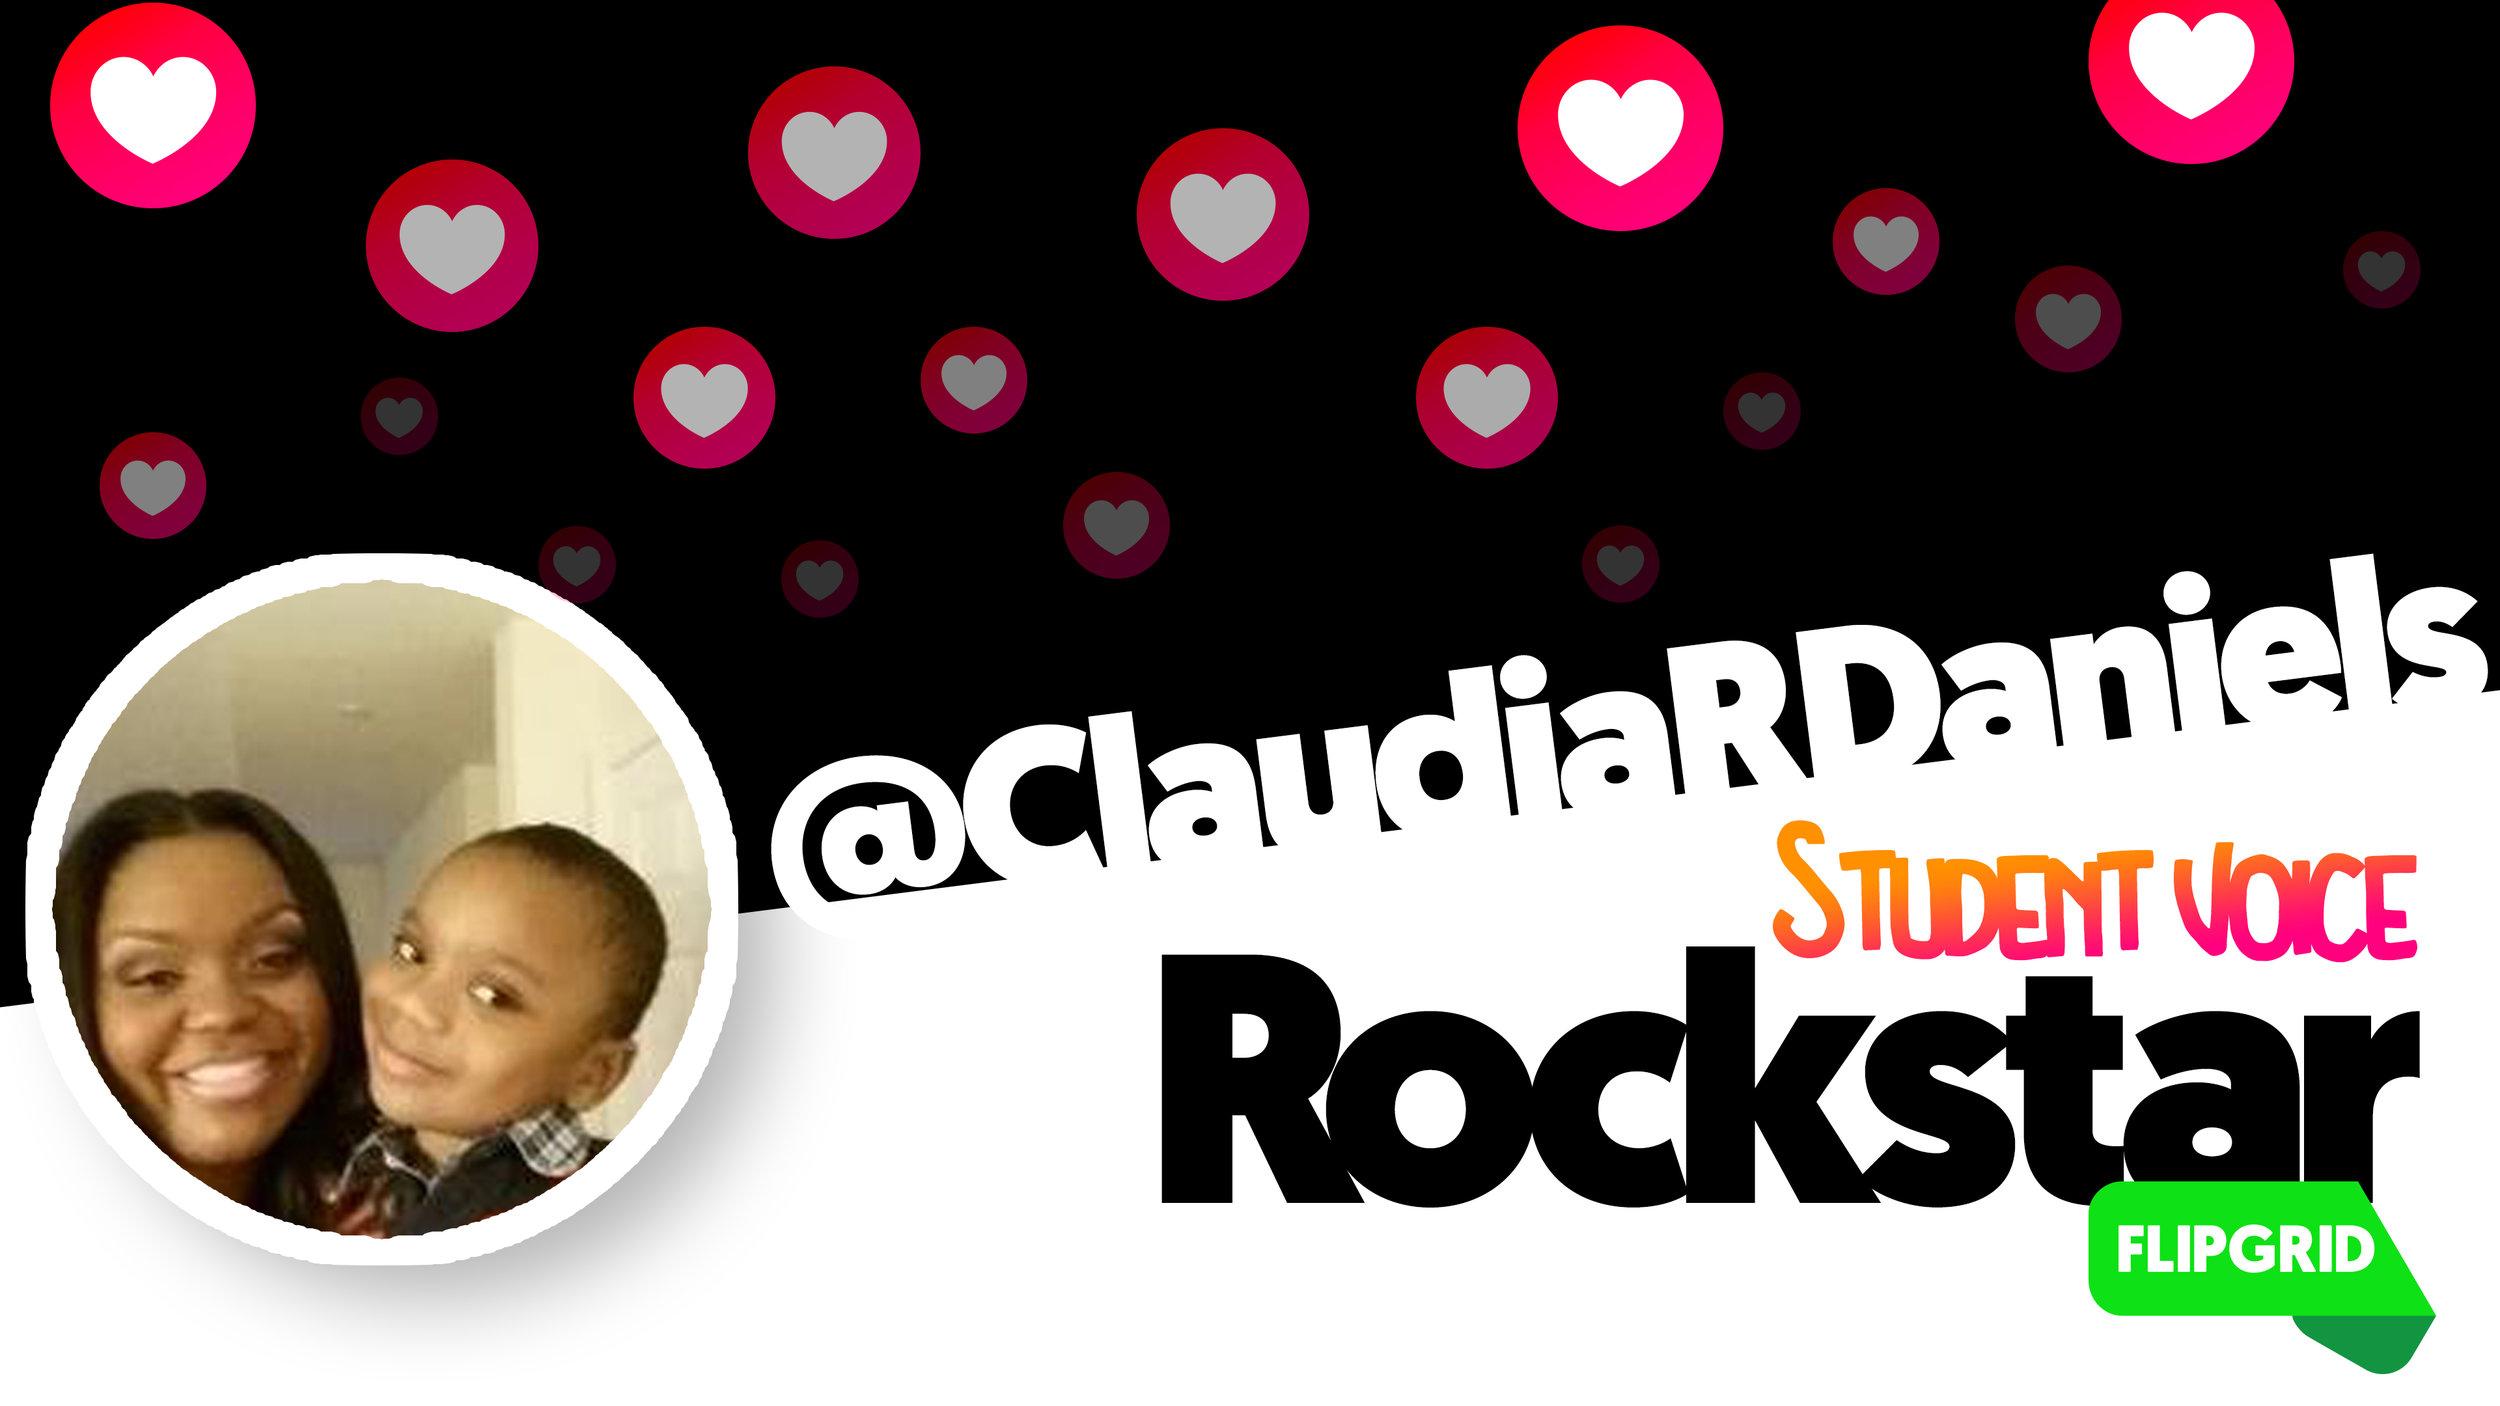 ClaudiaRDaniels_Rockstar.jpg